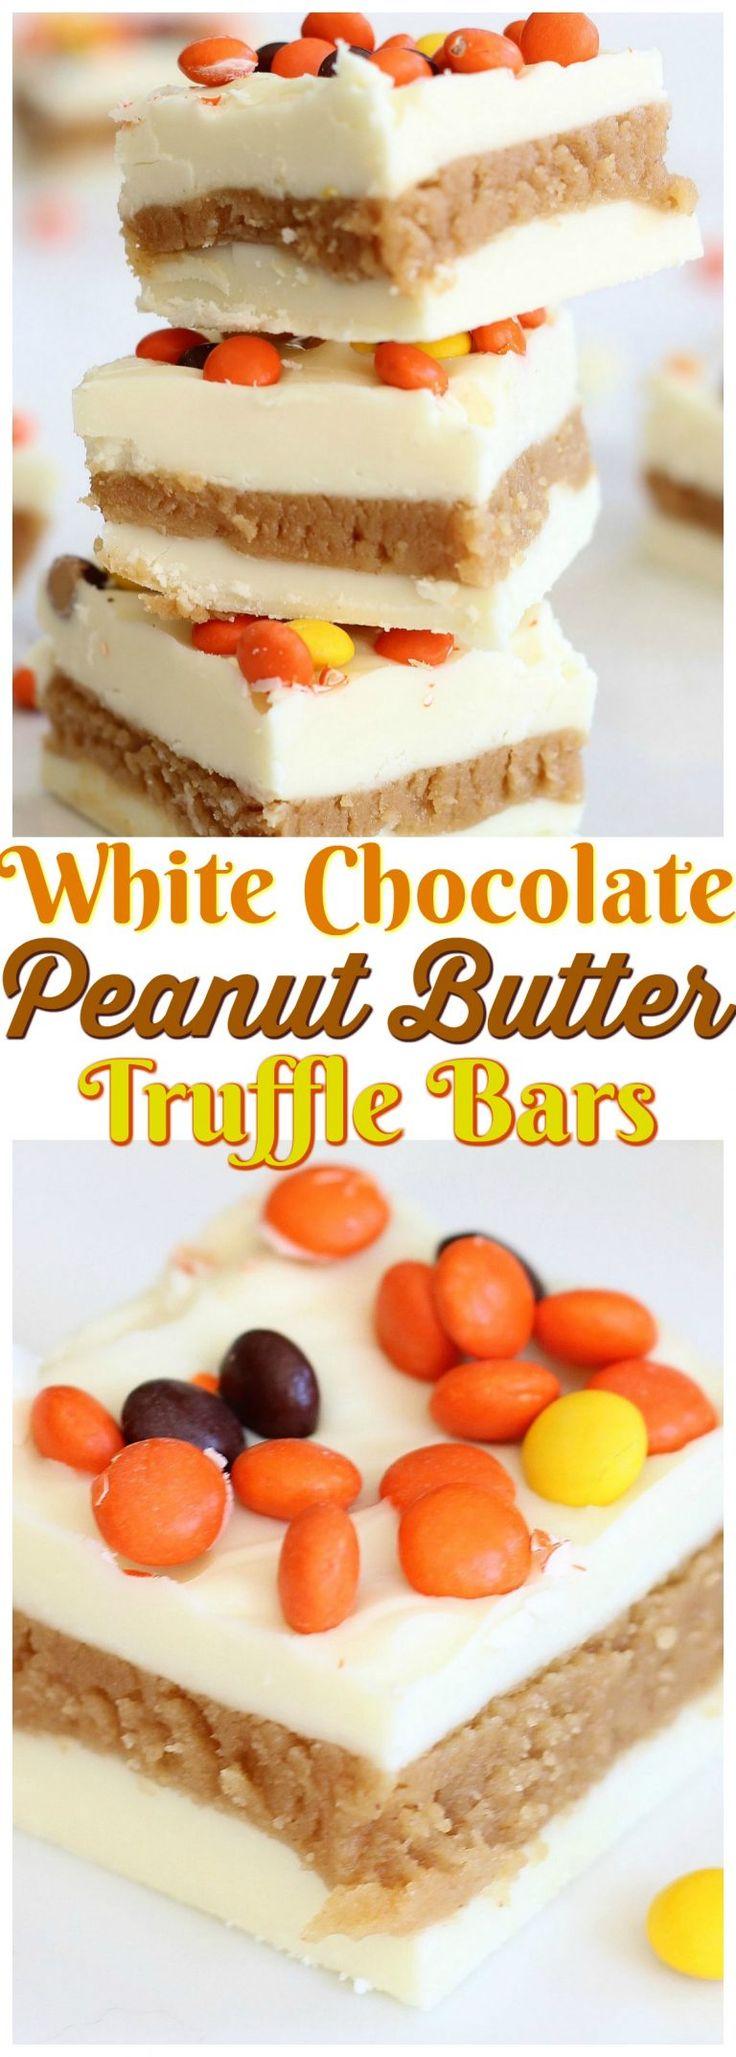 White Chocolate Peanut Butter Truffle Bars recipe image thegoldlininggirl.com pin 1